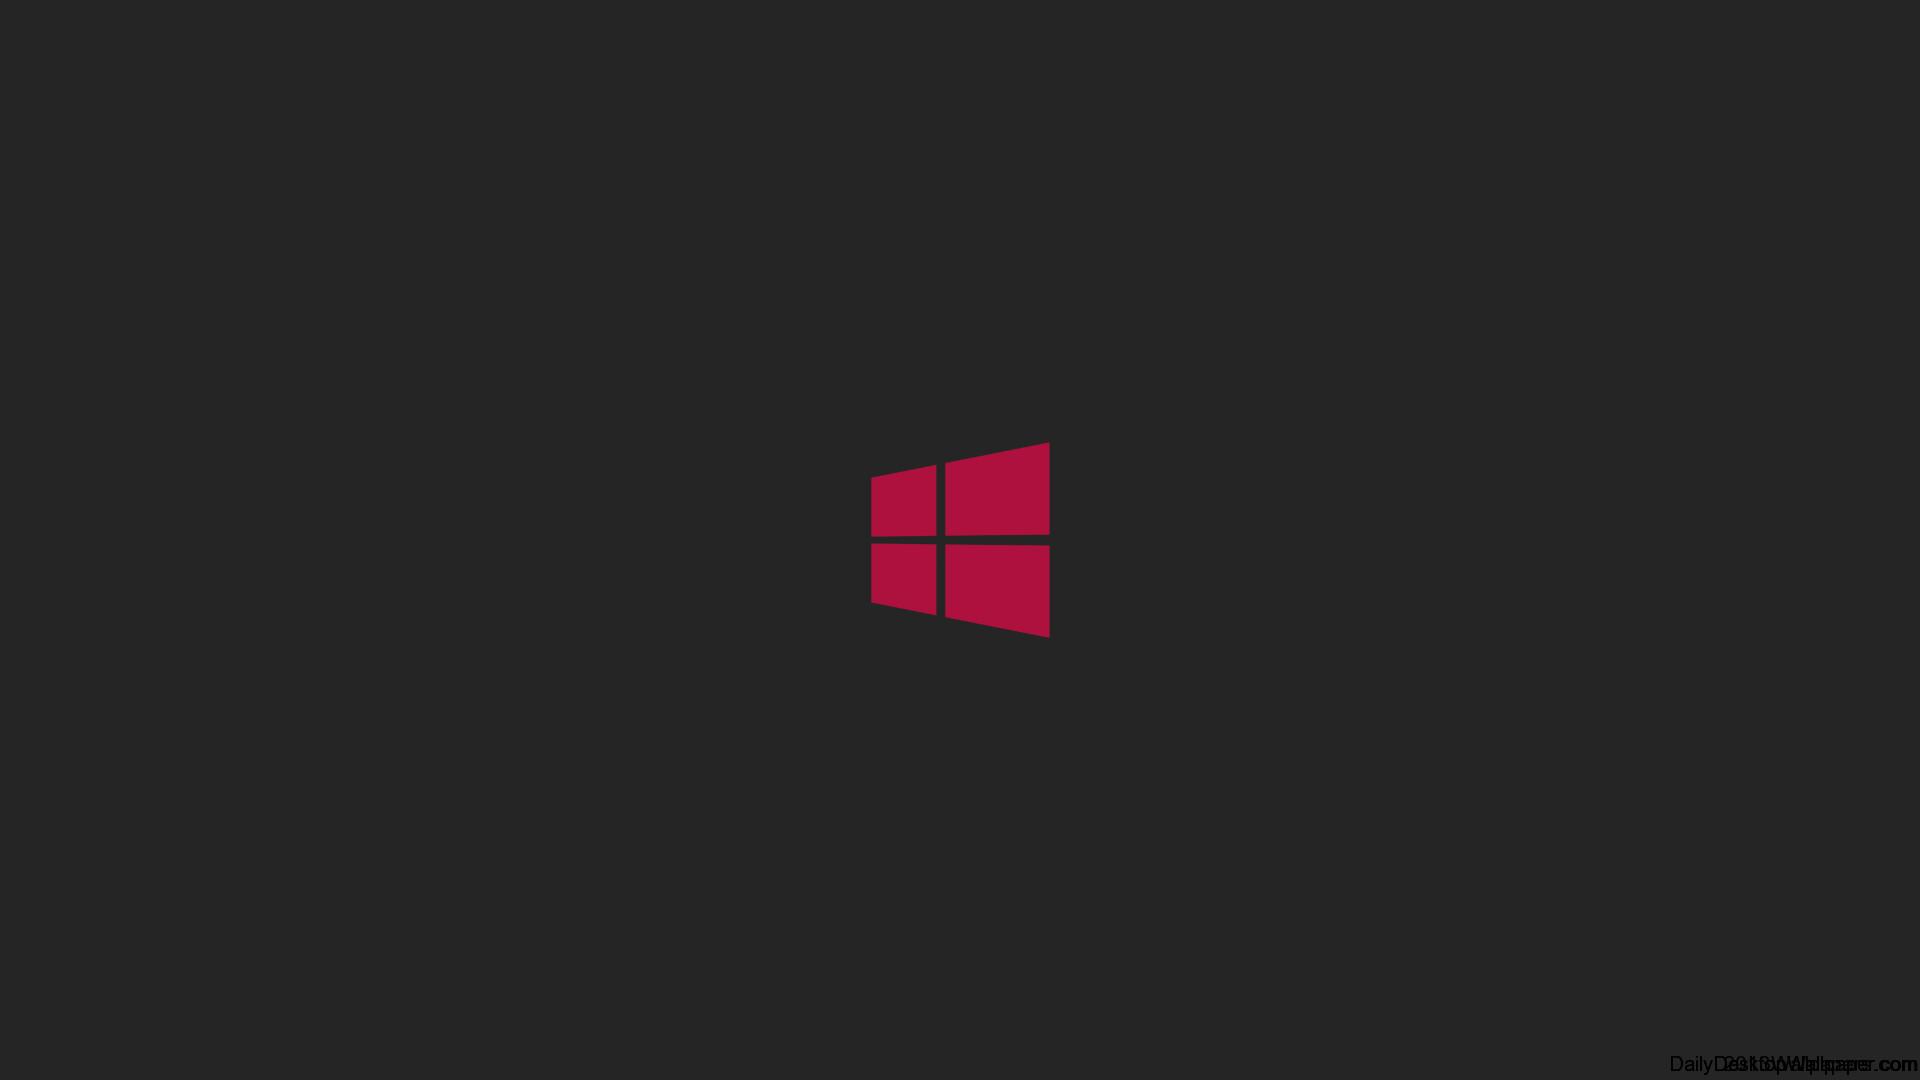 Res: 1920x1080, Window Wallpapers 12 - 1920 X 1080